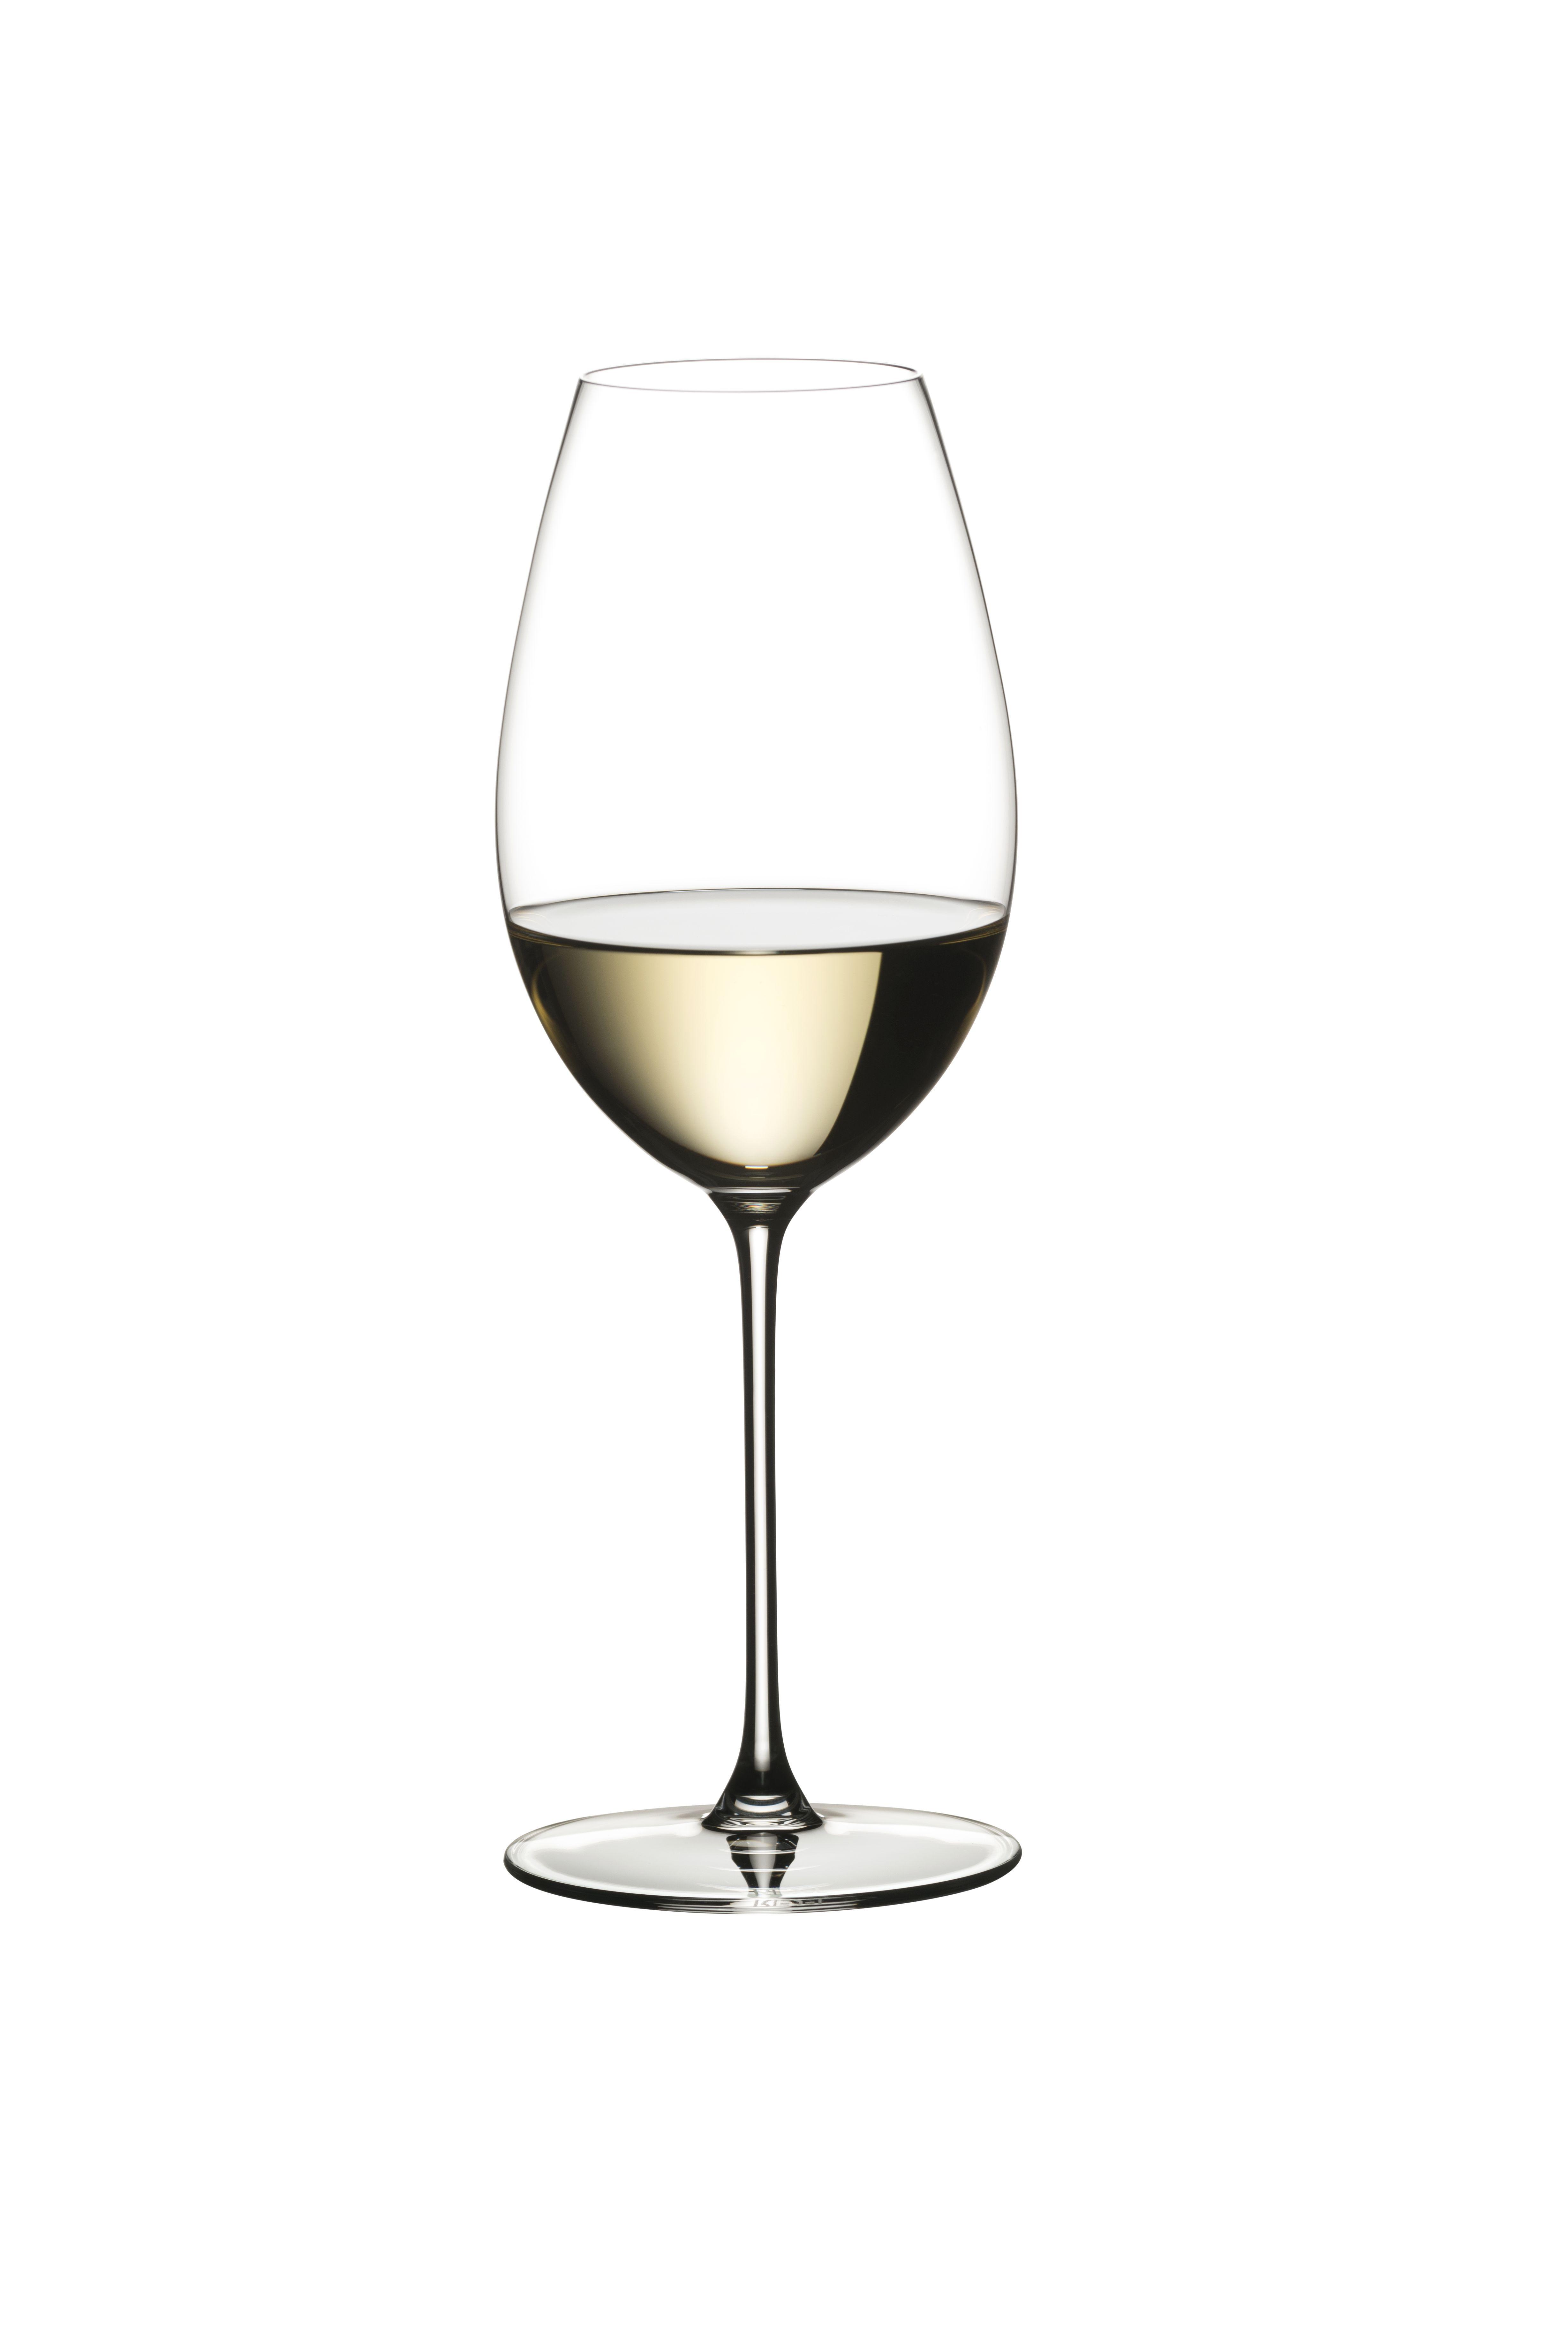 1449_33_riedel_sauvignon_blanc_wijnglas_veritas.jpg